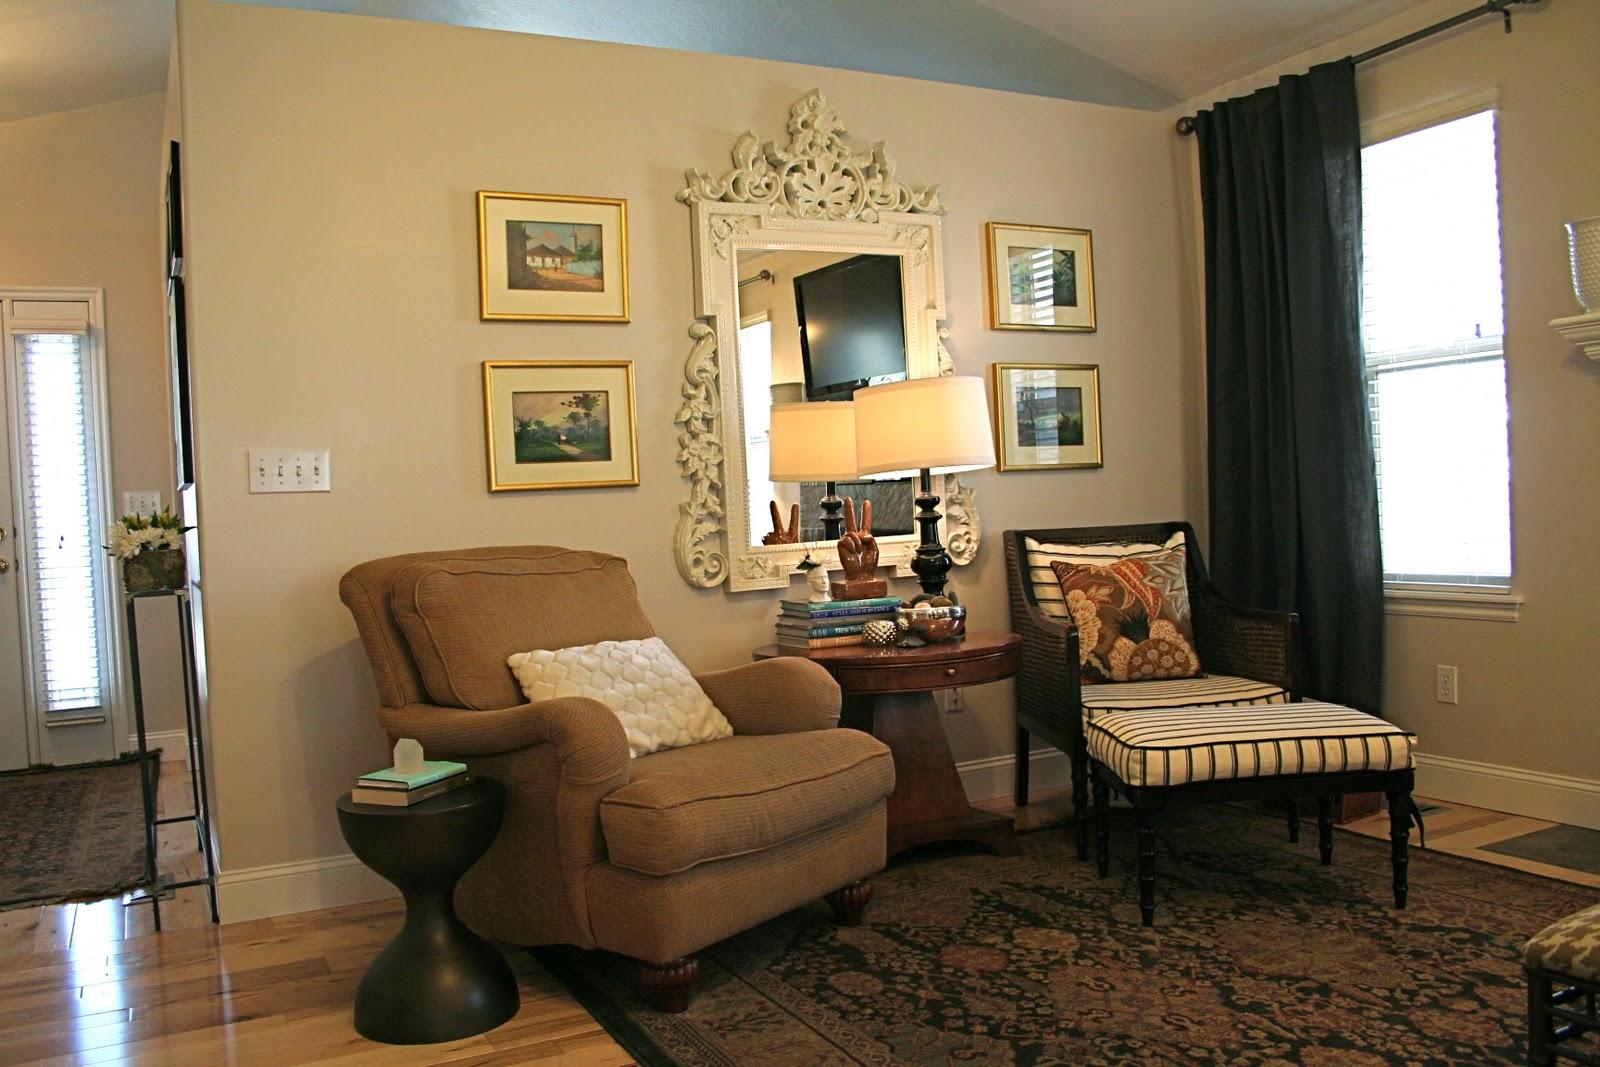 Upgrade Living Room: Design Dump: My Living Room: An Update